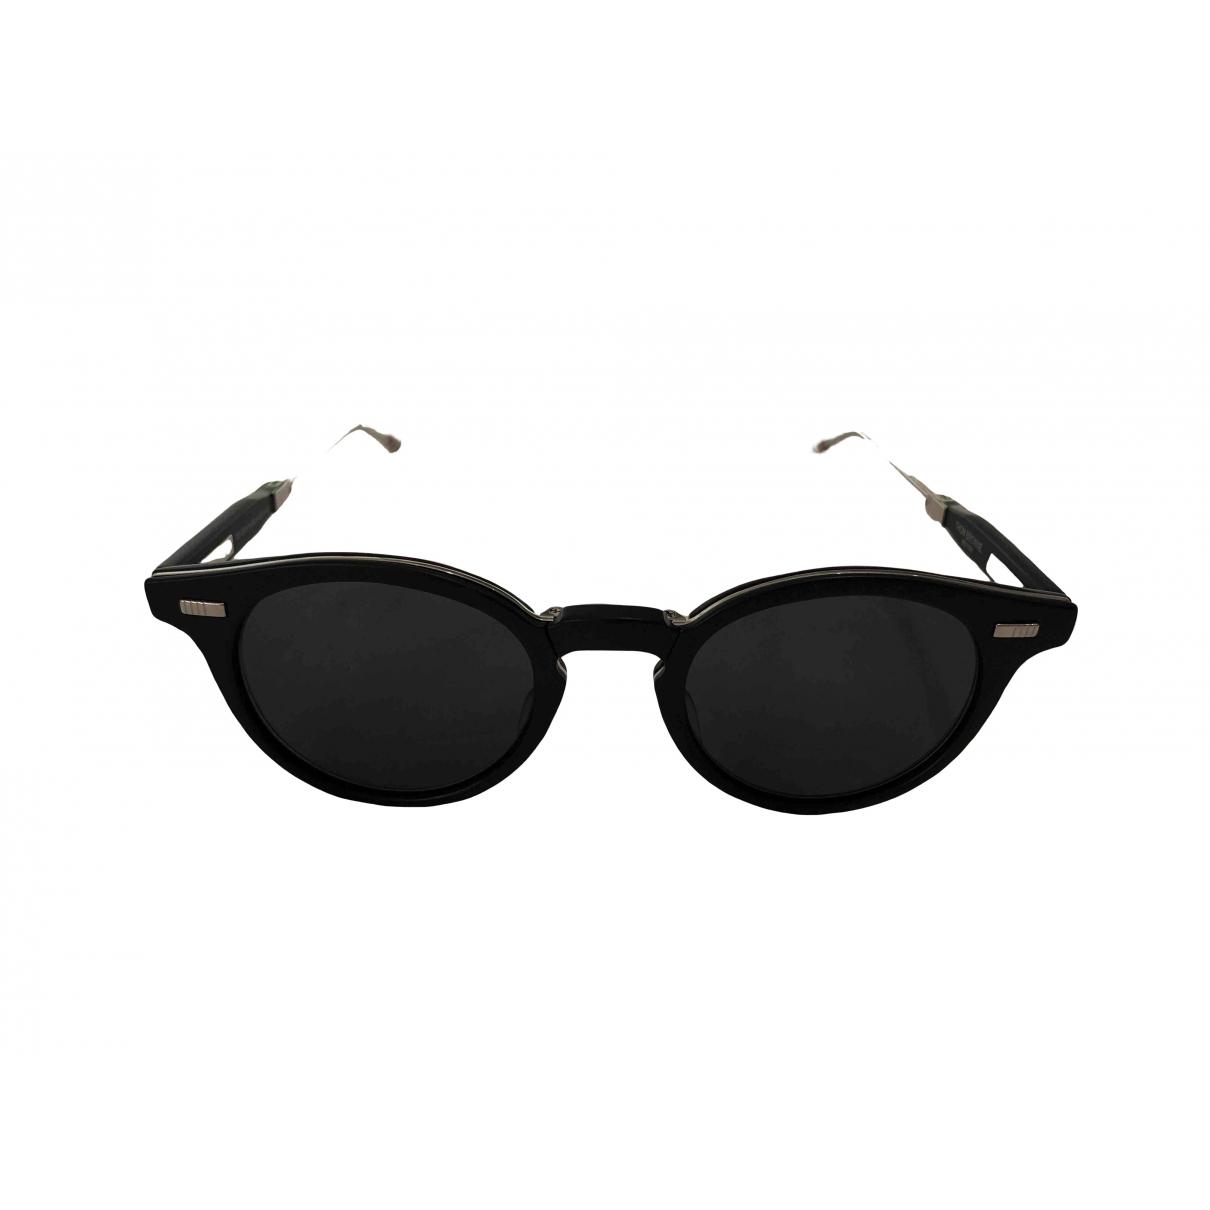 Gafas Thom Browne